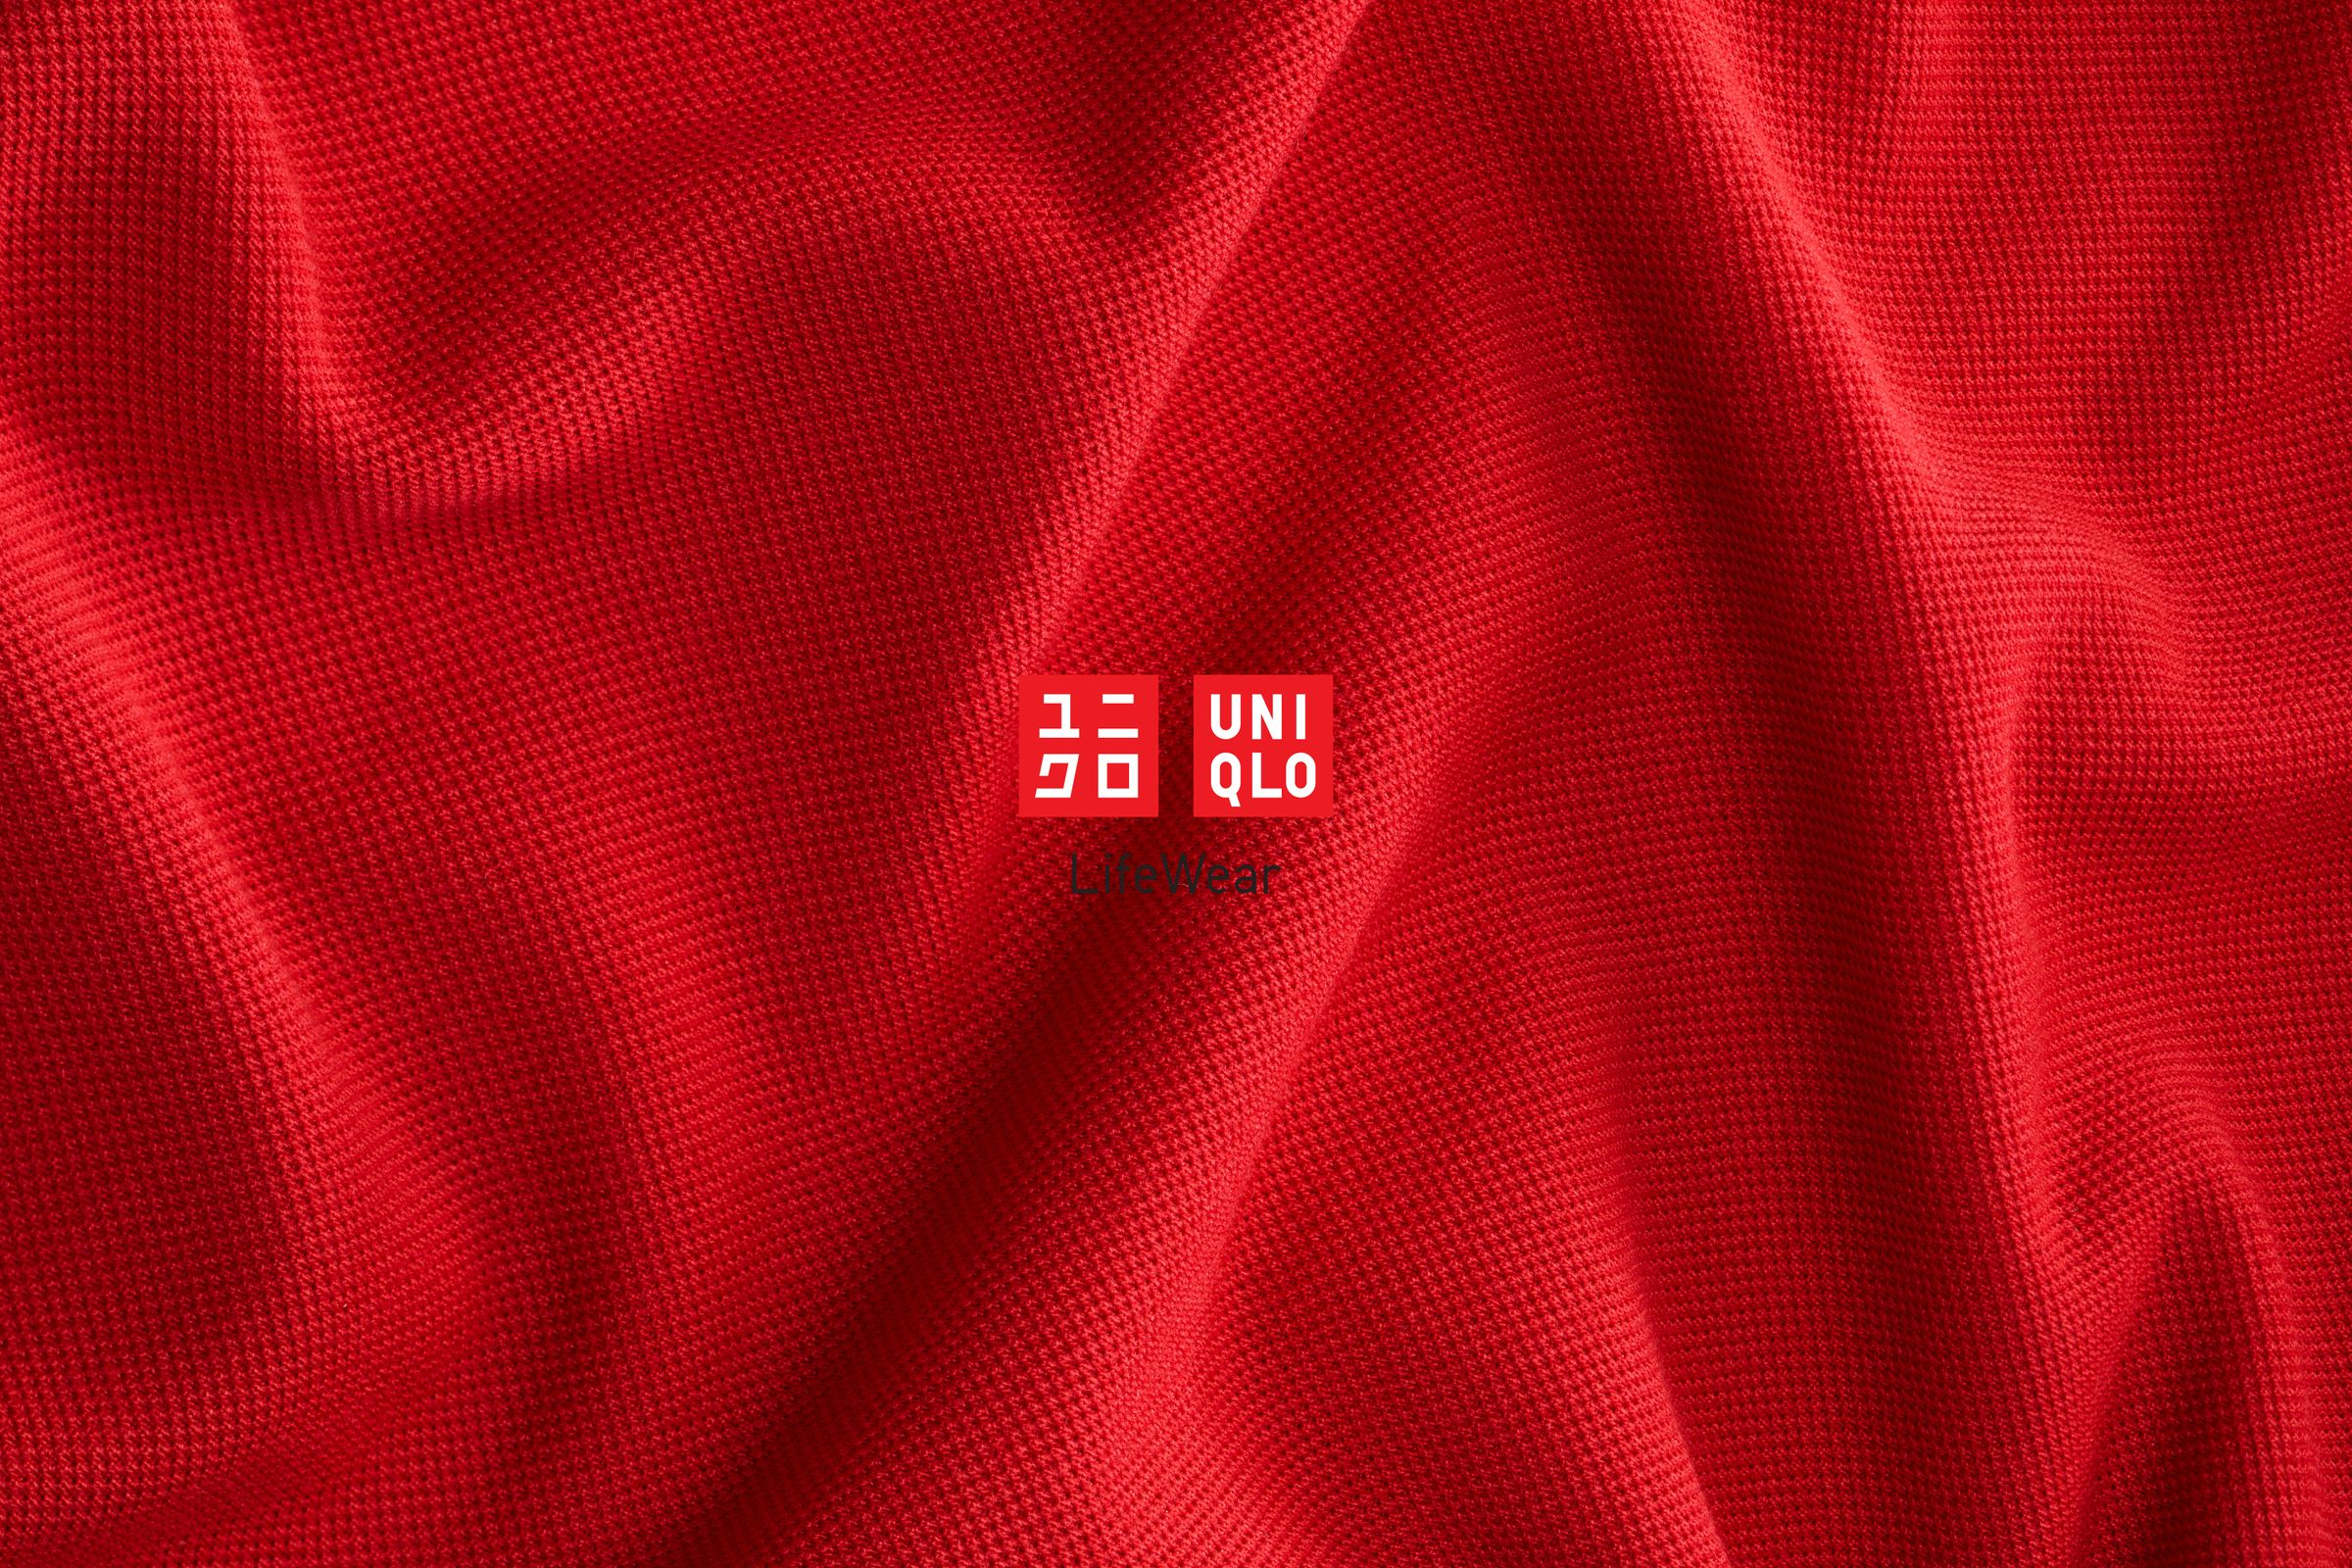 Uniqlo fabric image with logo